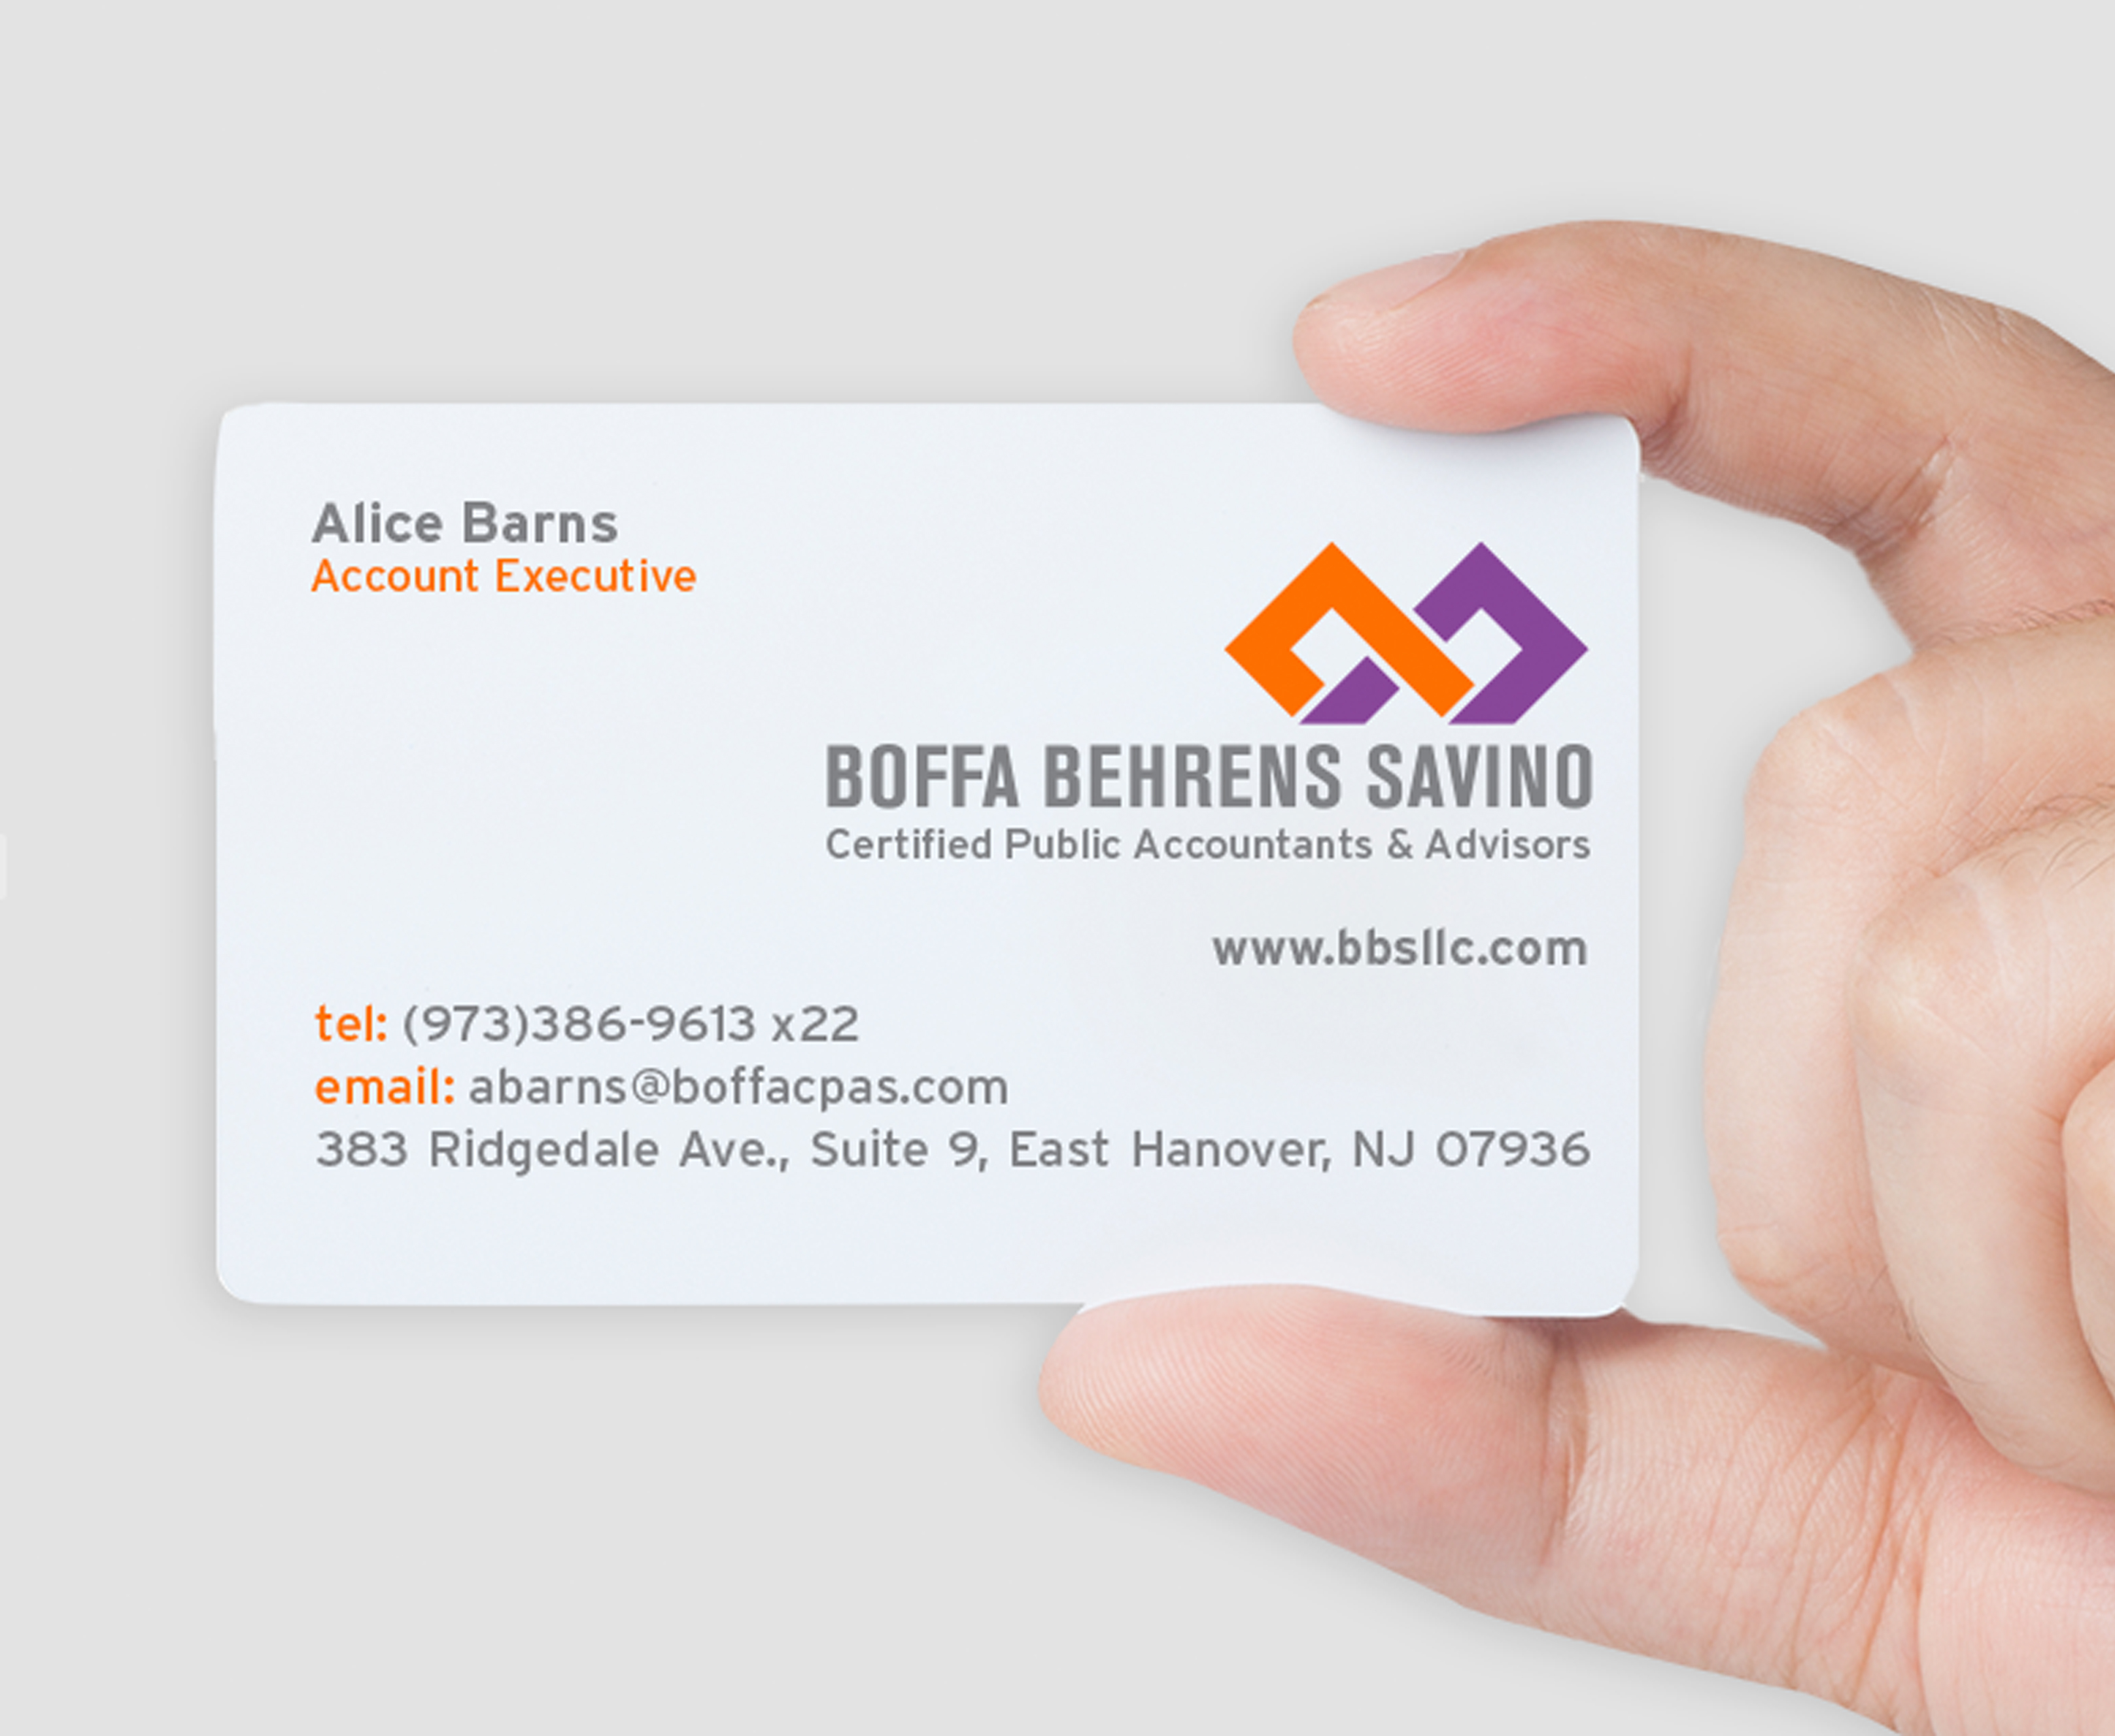 New Identity for Boffa Behrens Savino